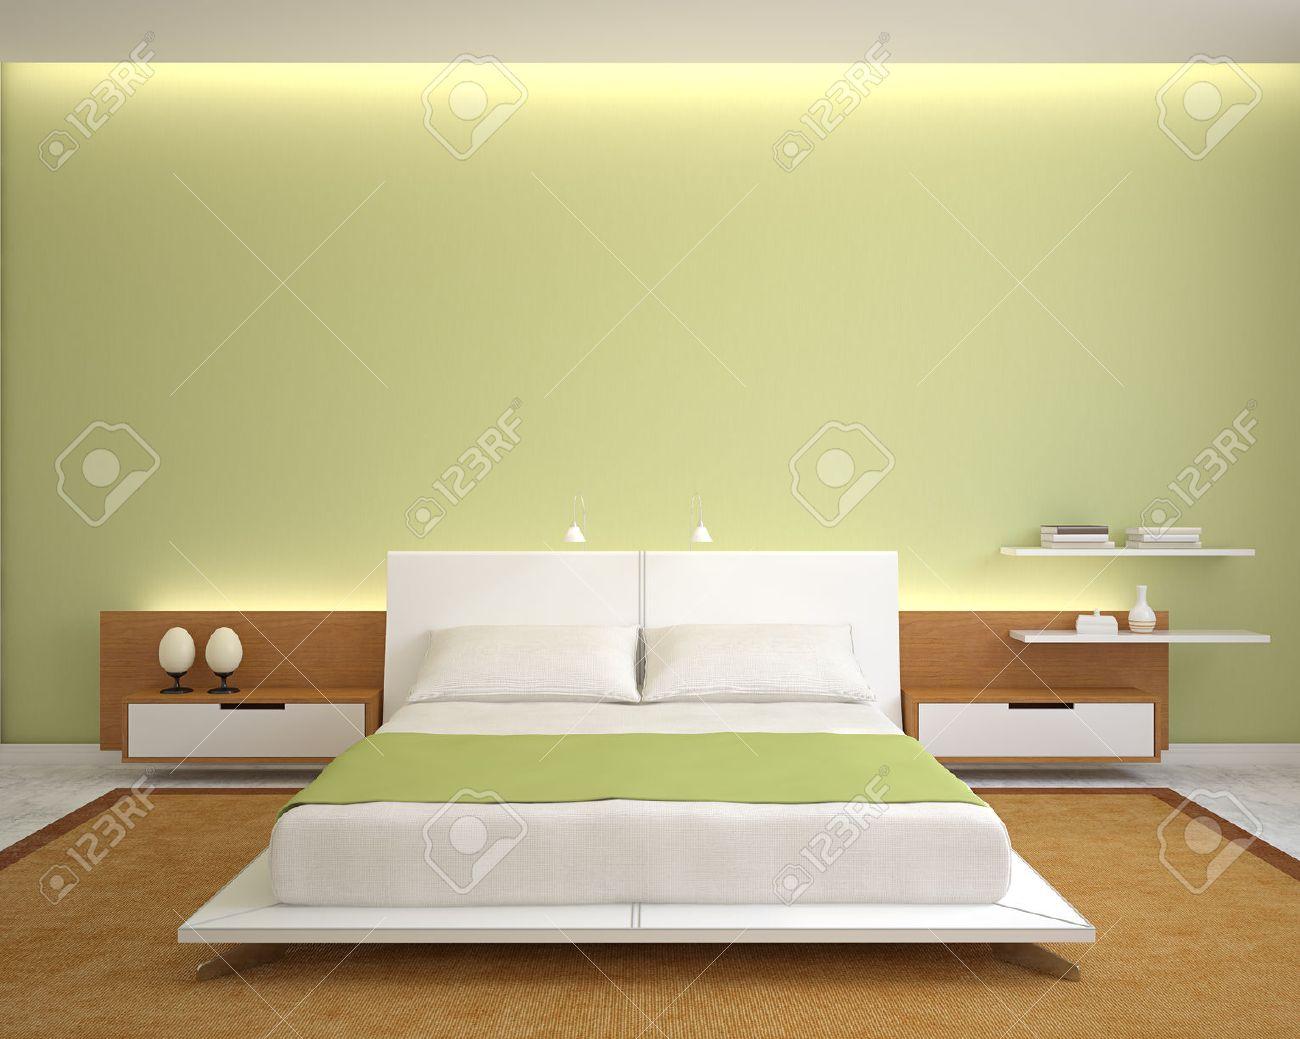 Chambre Moderne | Chambre Deco Moderne Avec Deco Chambre Moderne ...